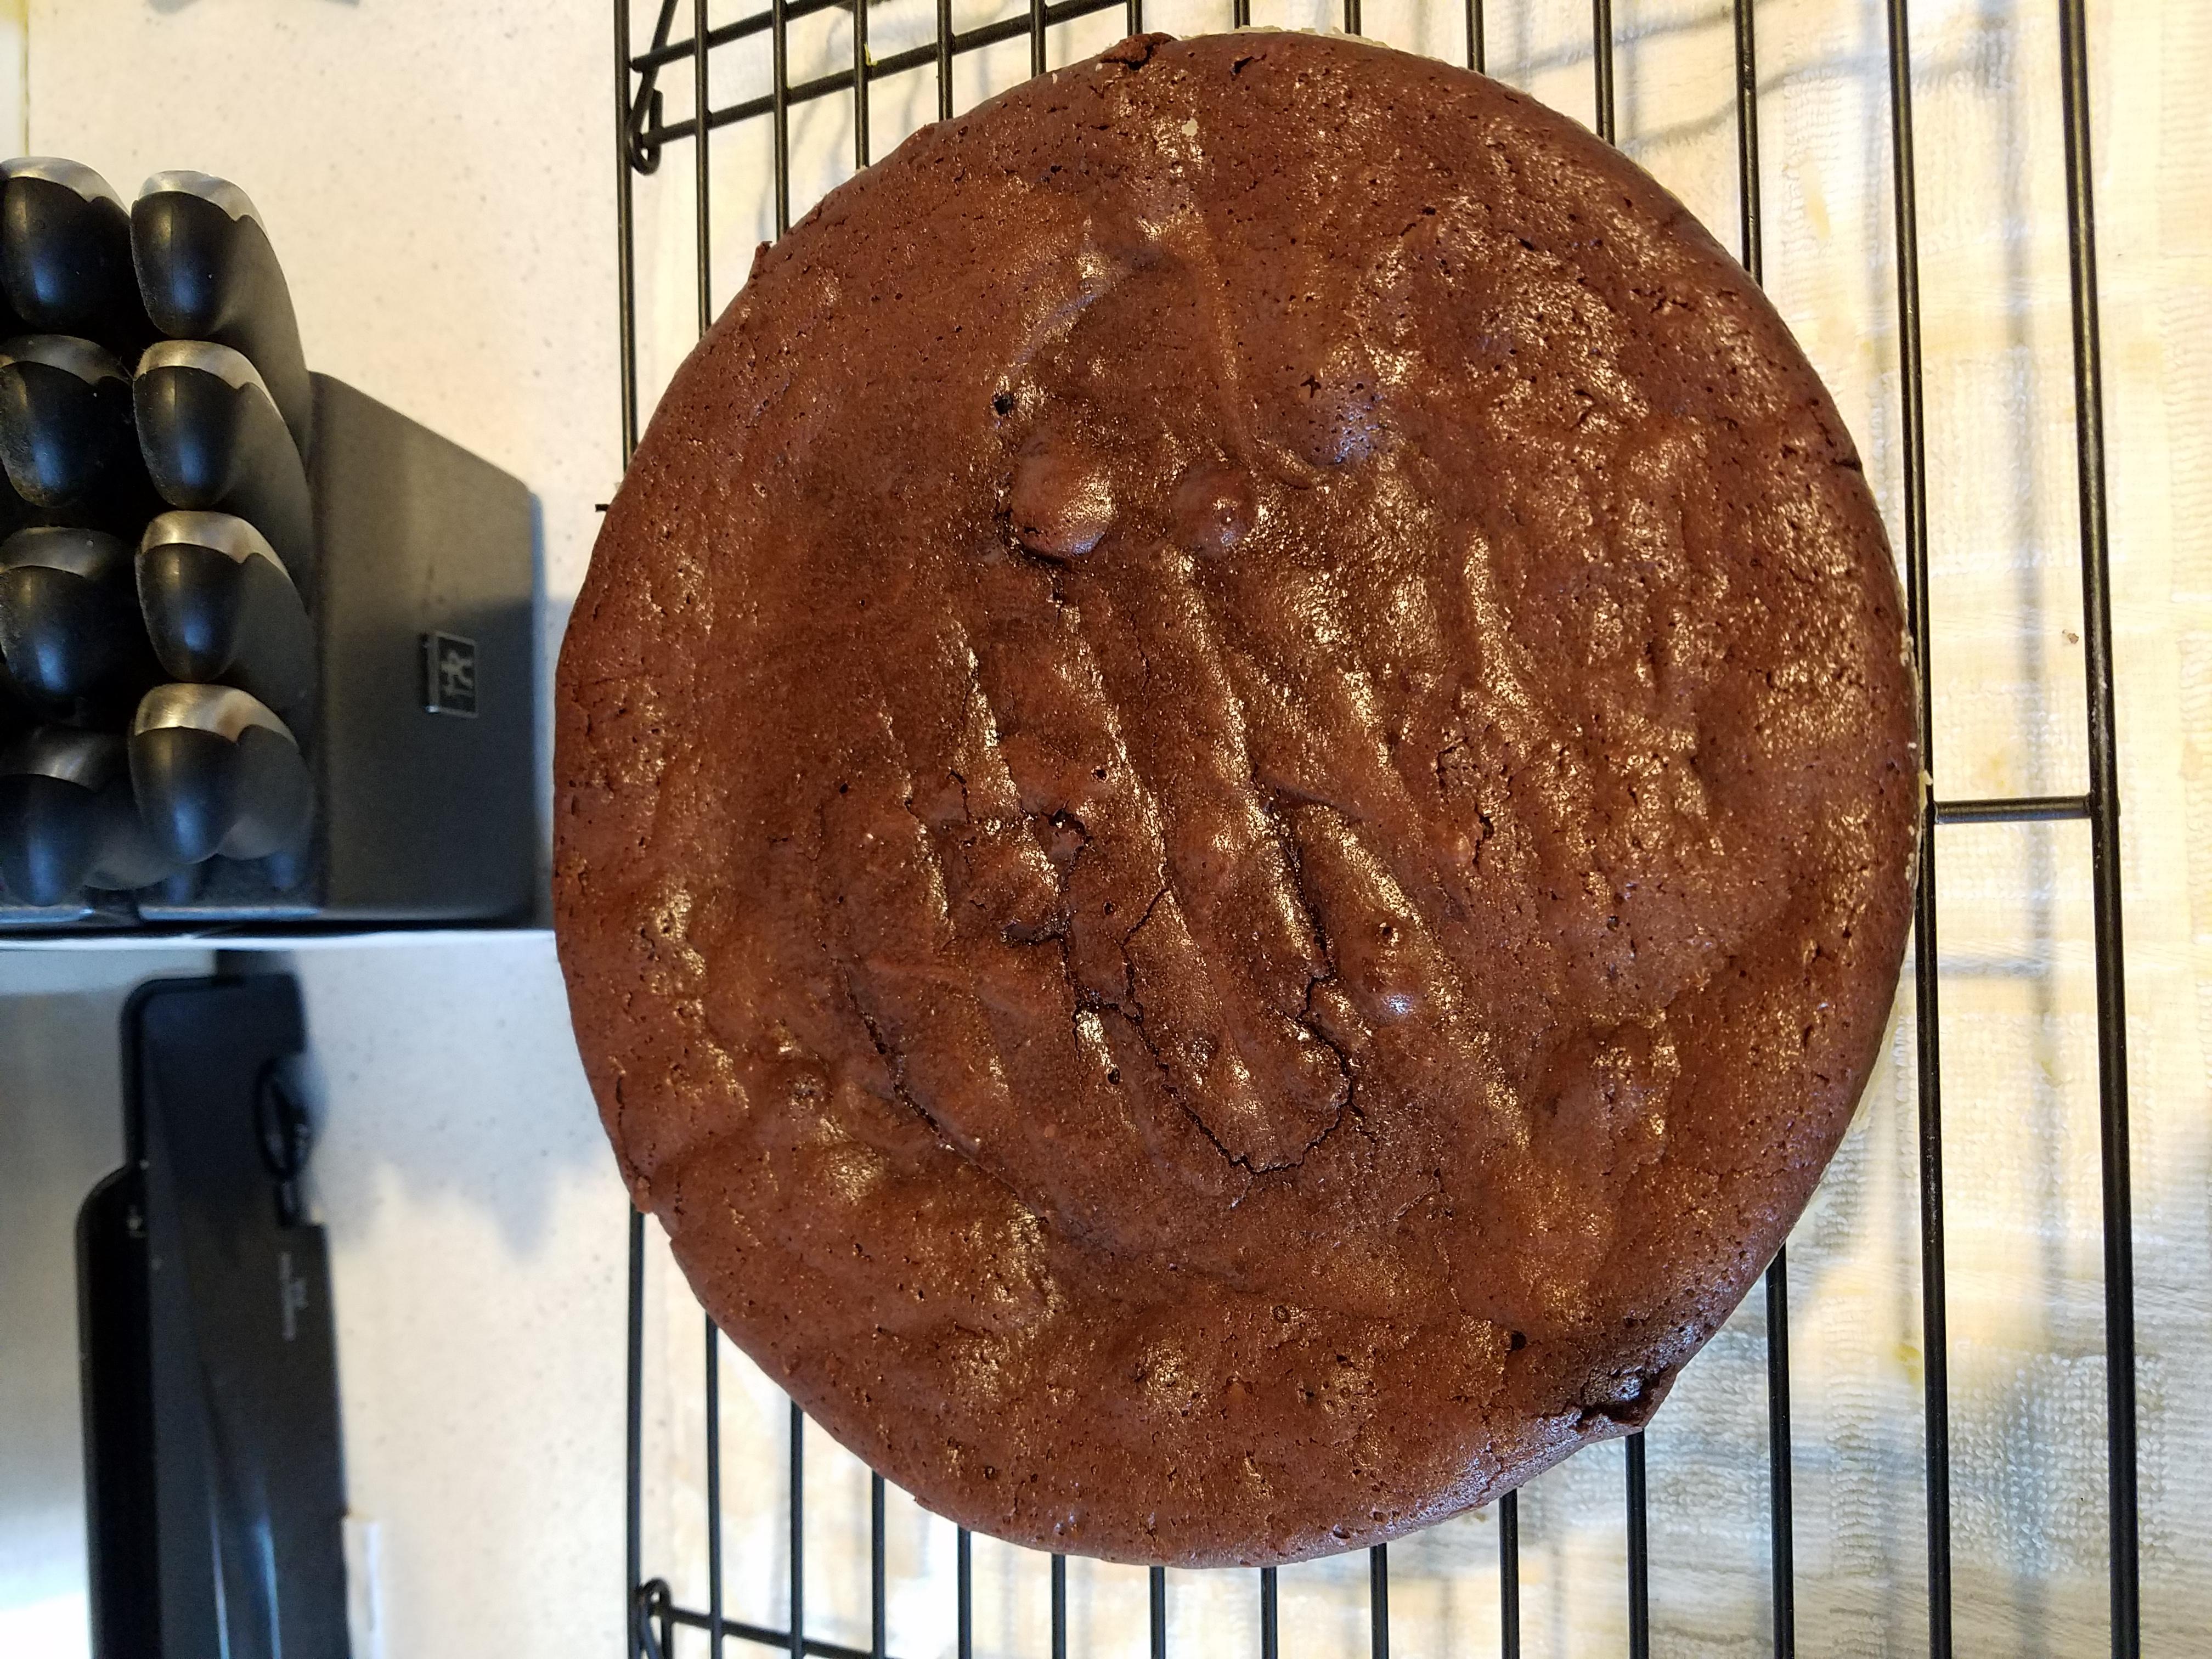 Chef John's Chocolate Decadence